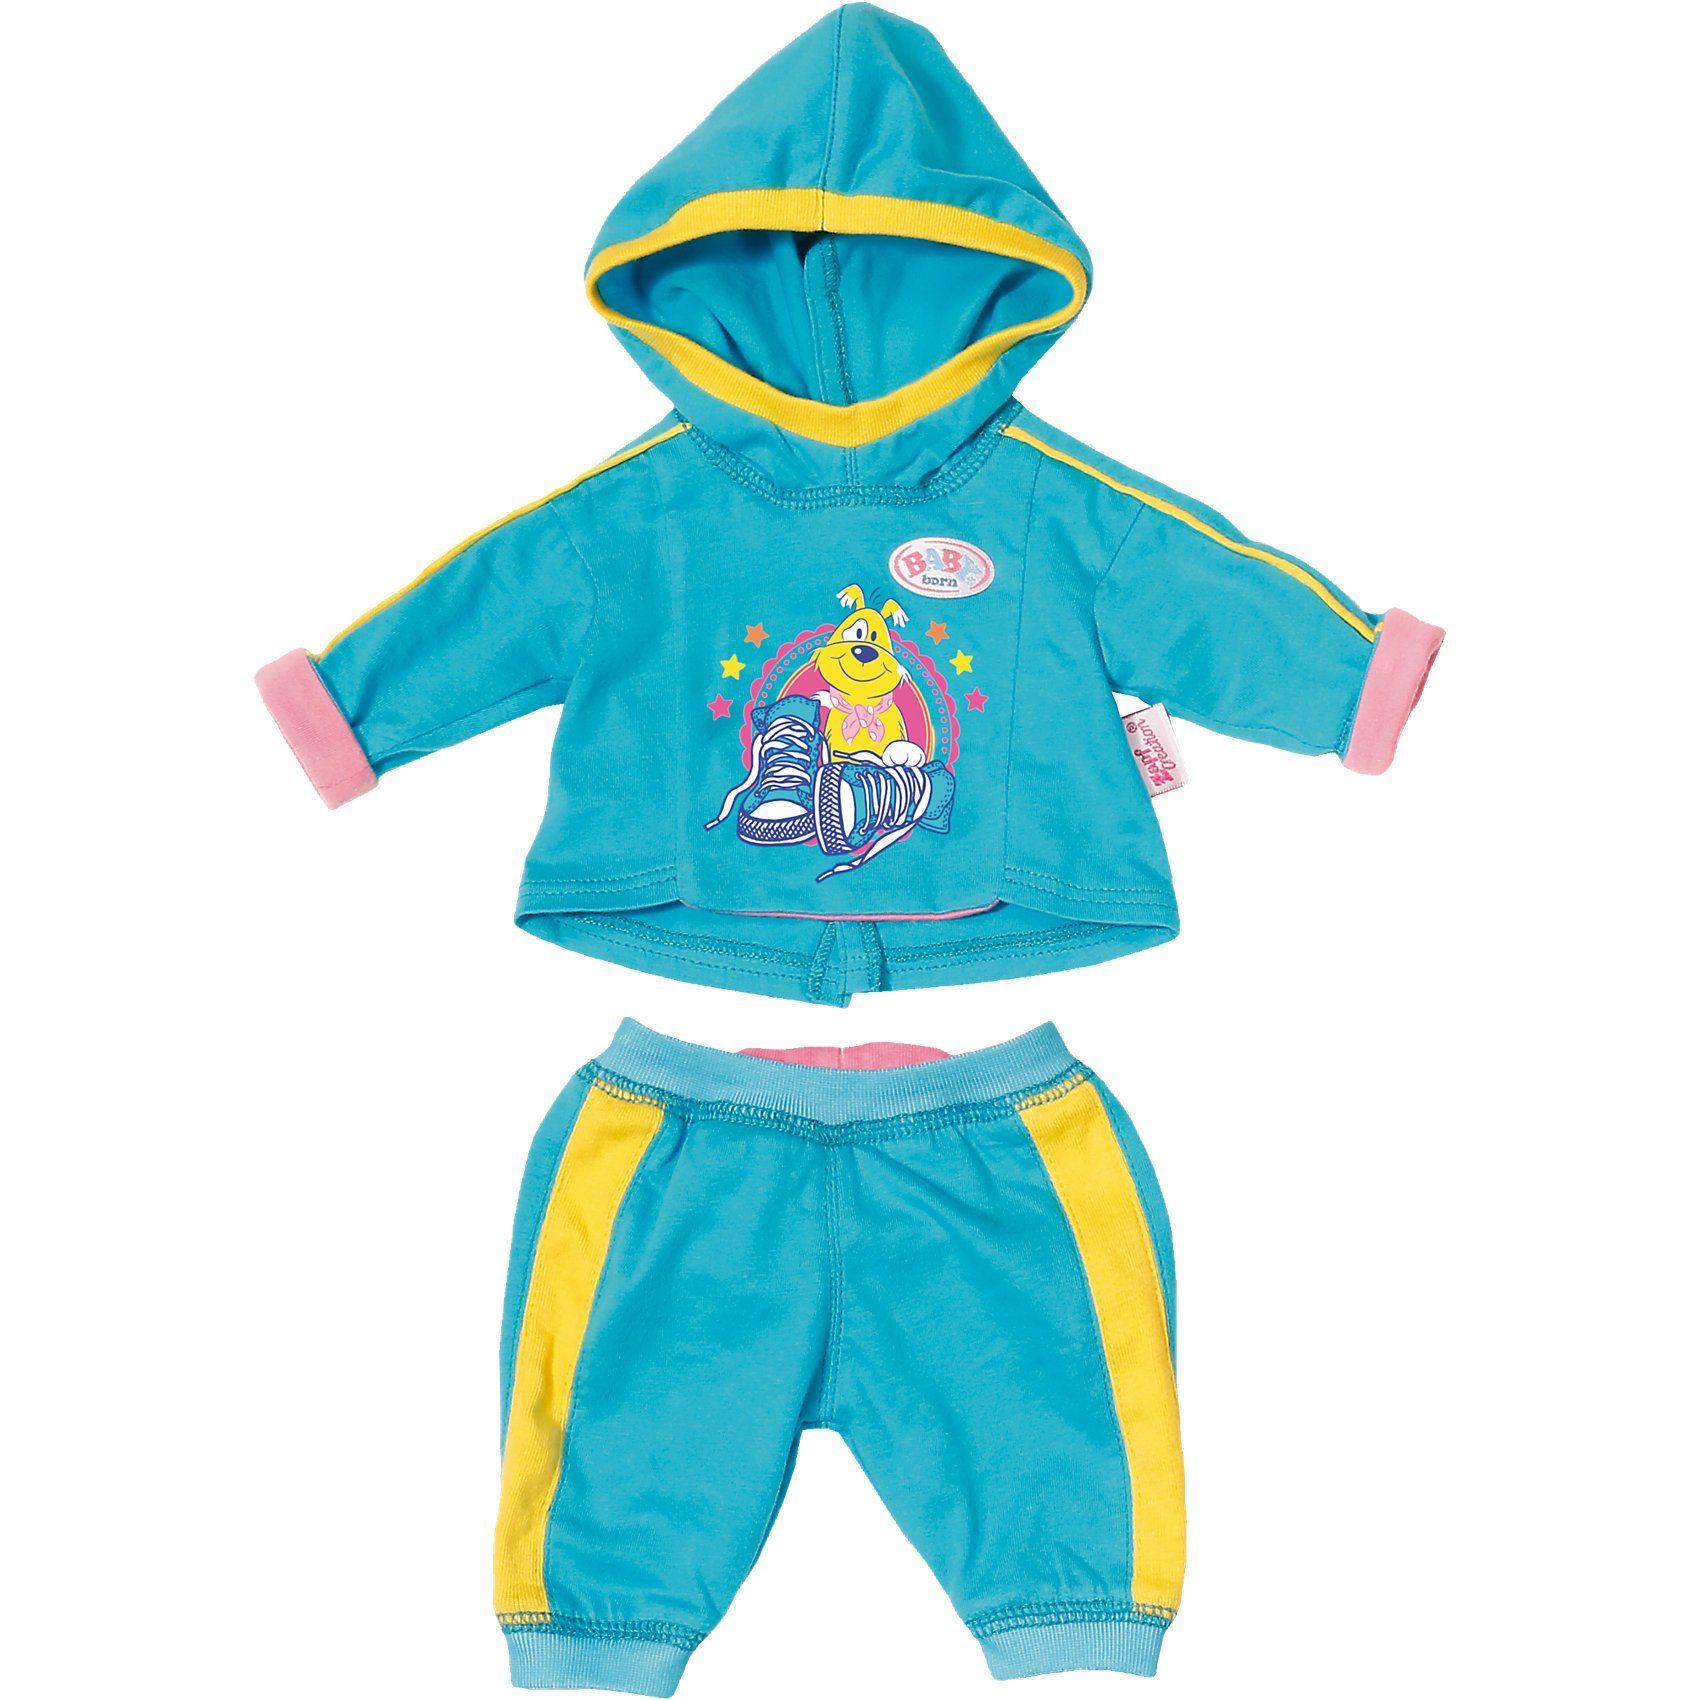 Zapf Creation® BABY born® Jogginganzug Blau Puppenkleidung, 43 cm